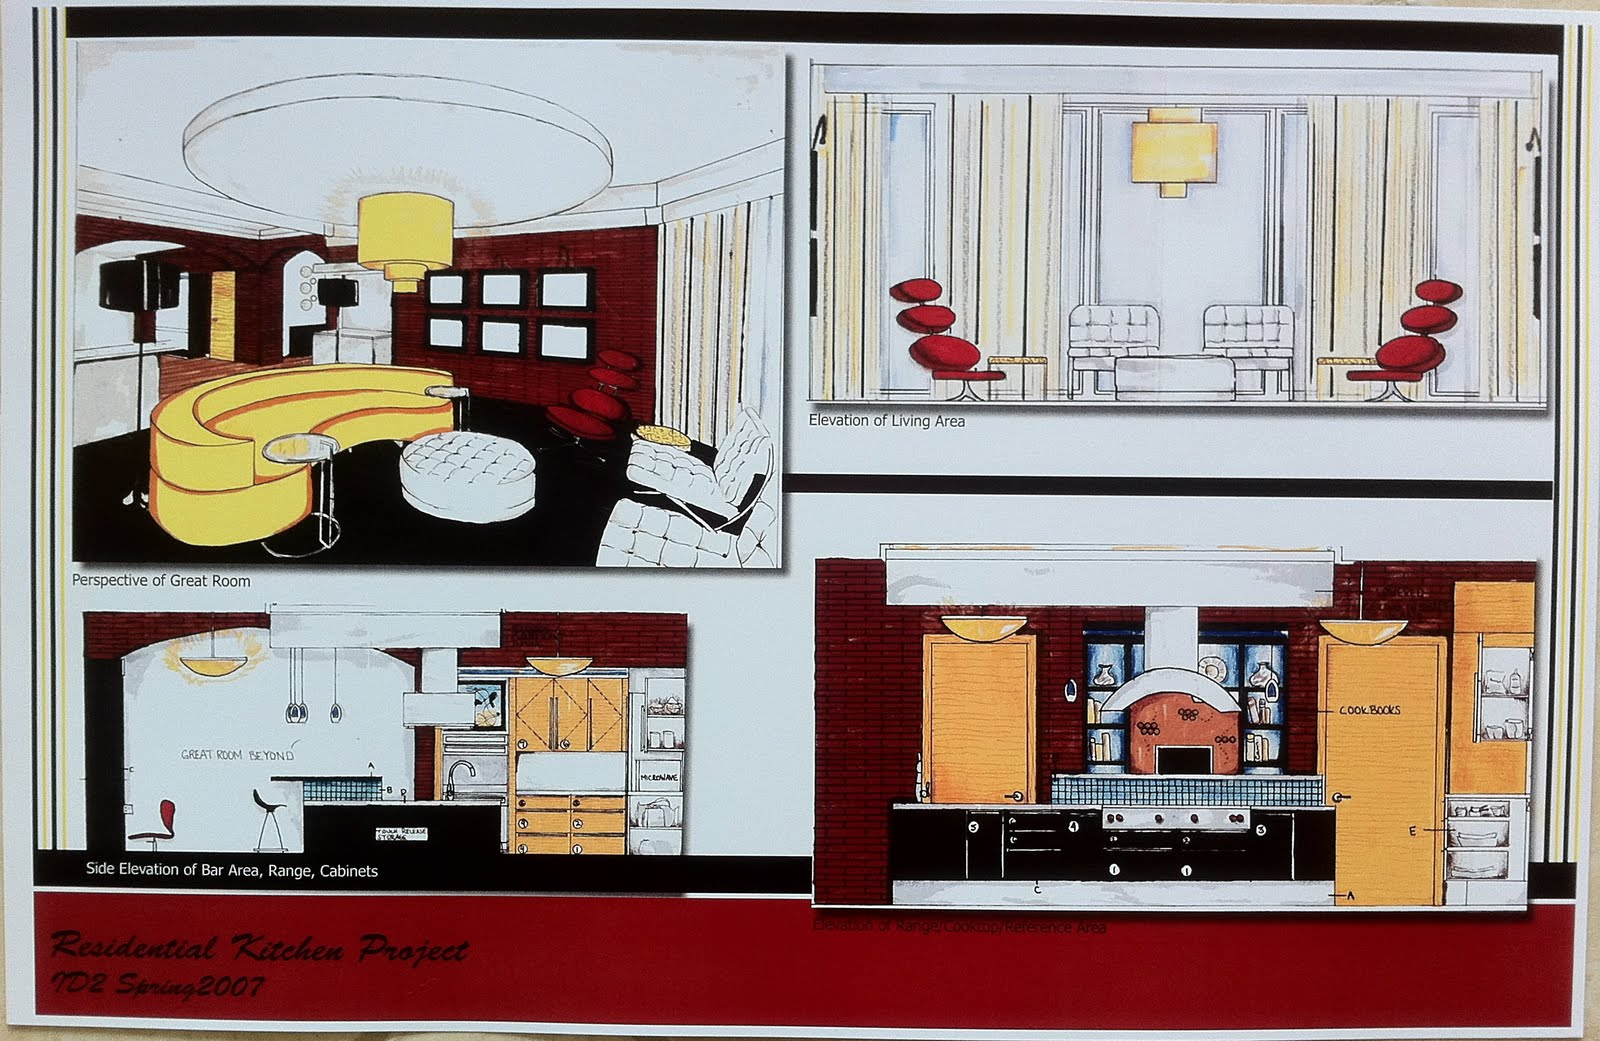 of Bar Area/Range/Cabinets, Elevation of Bar Area/Range/Cabinets